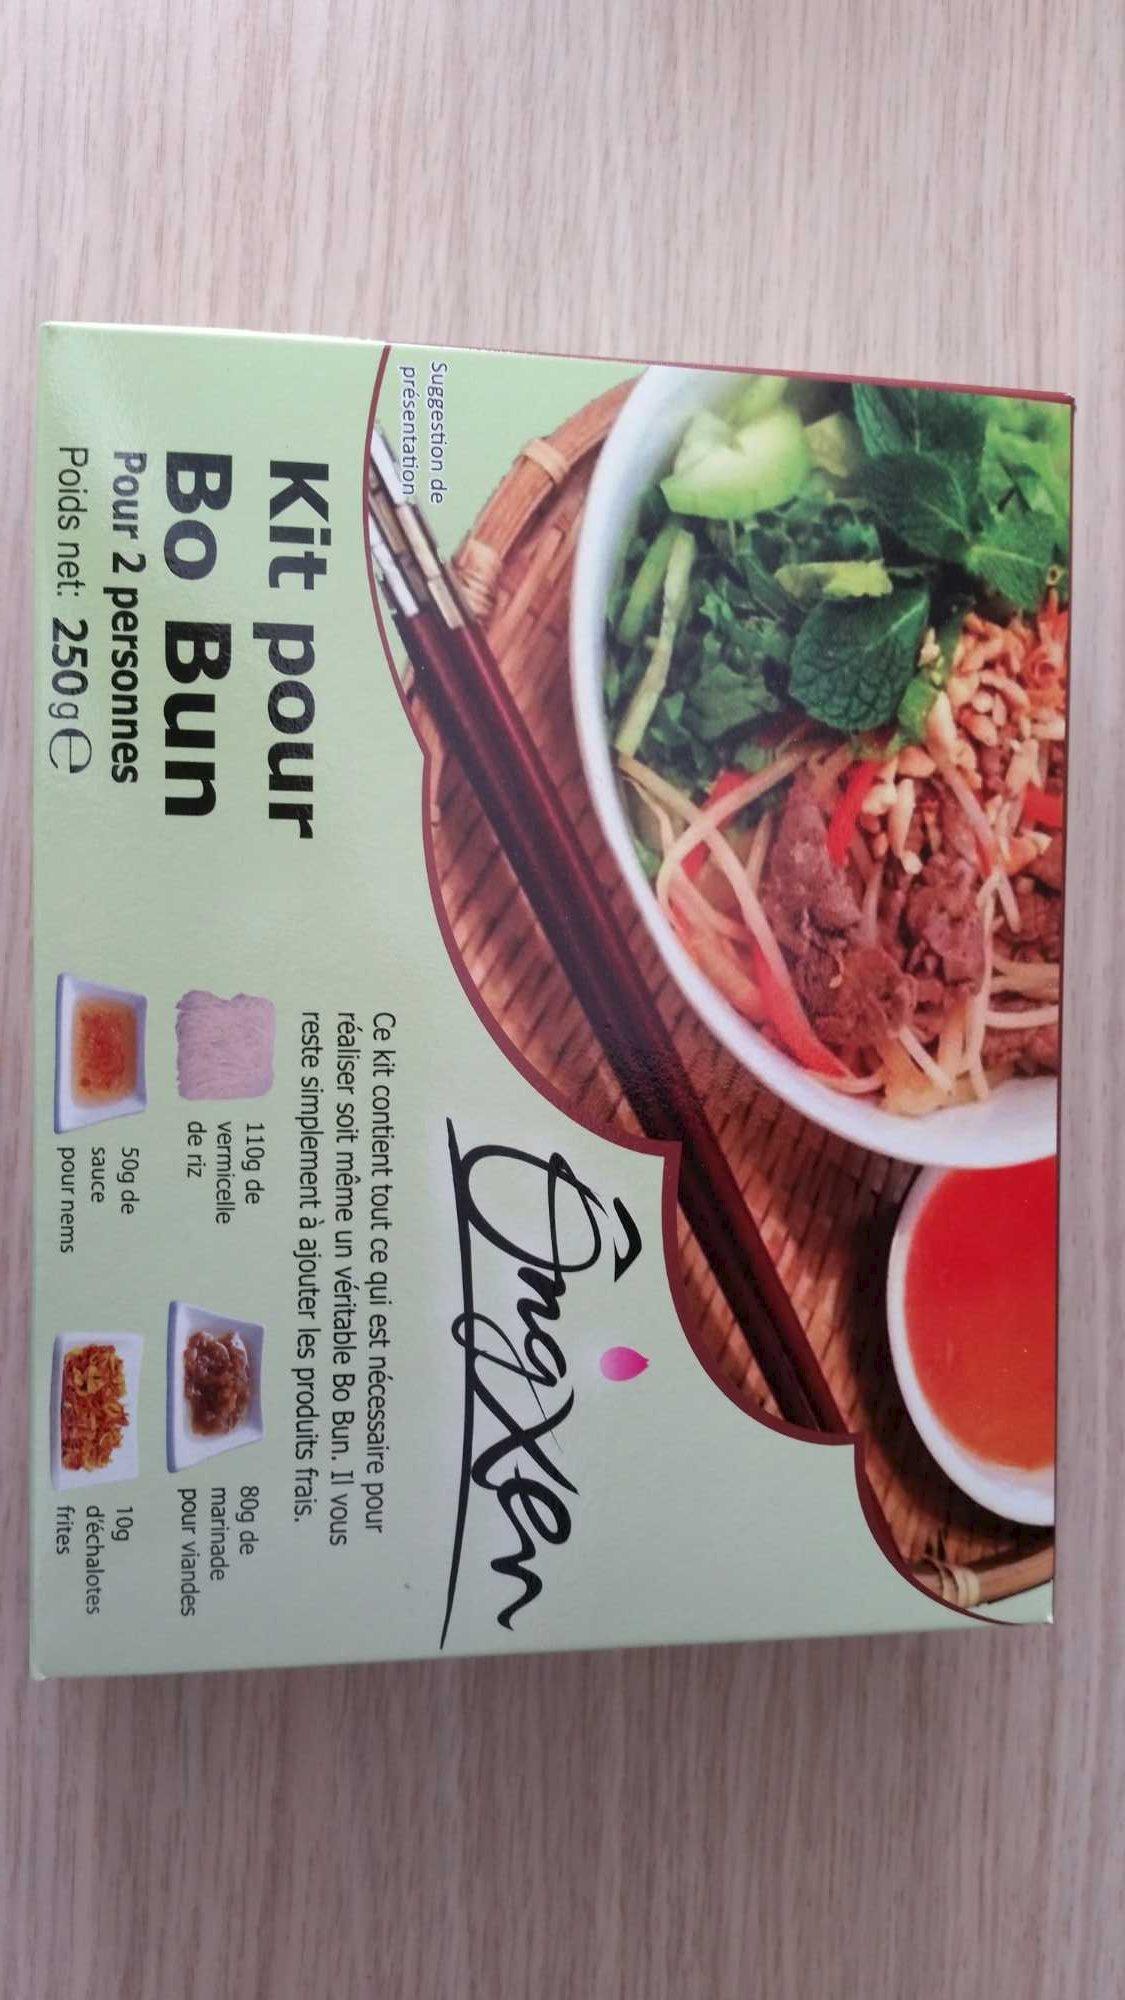 Kit pour bo bun - Product